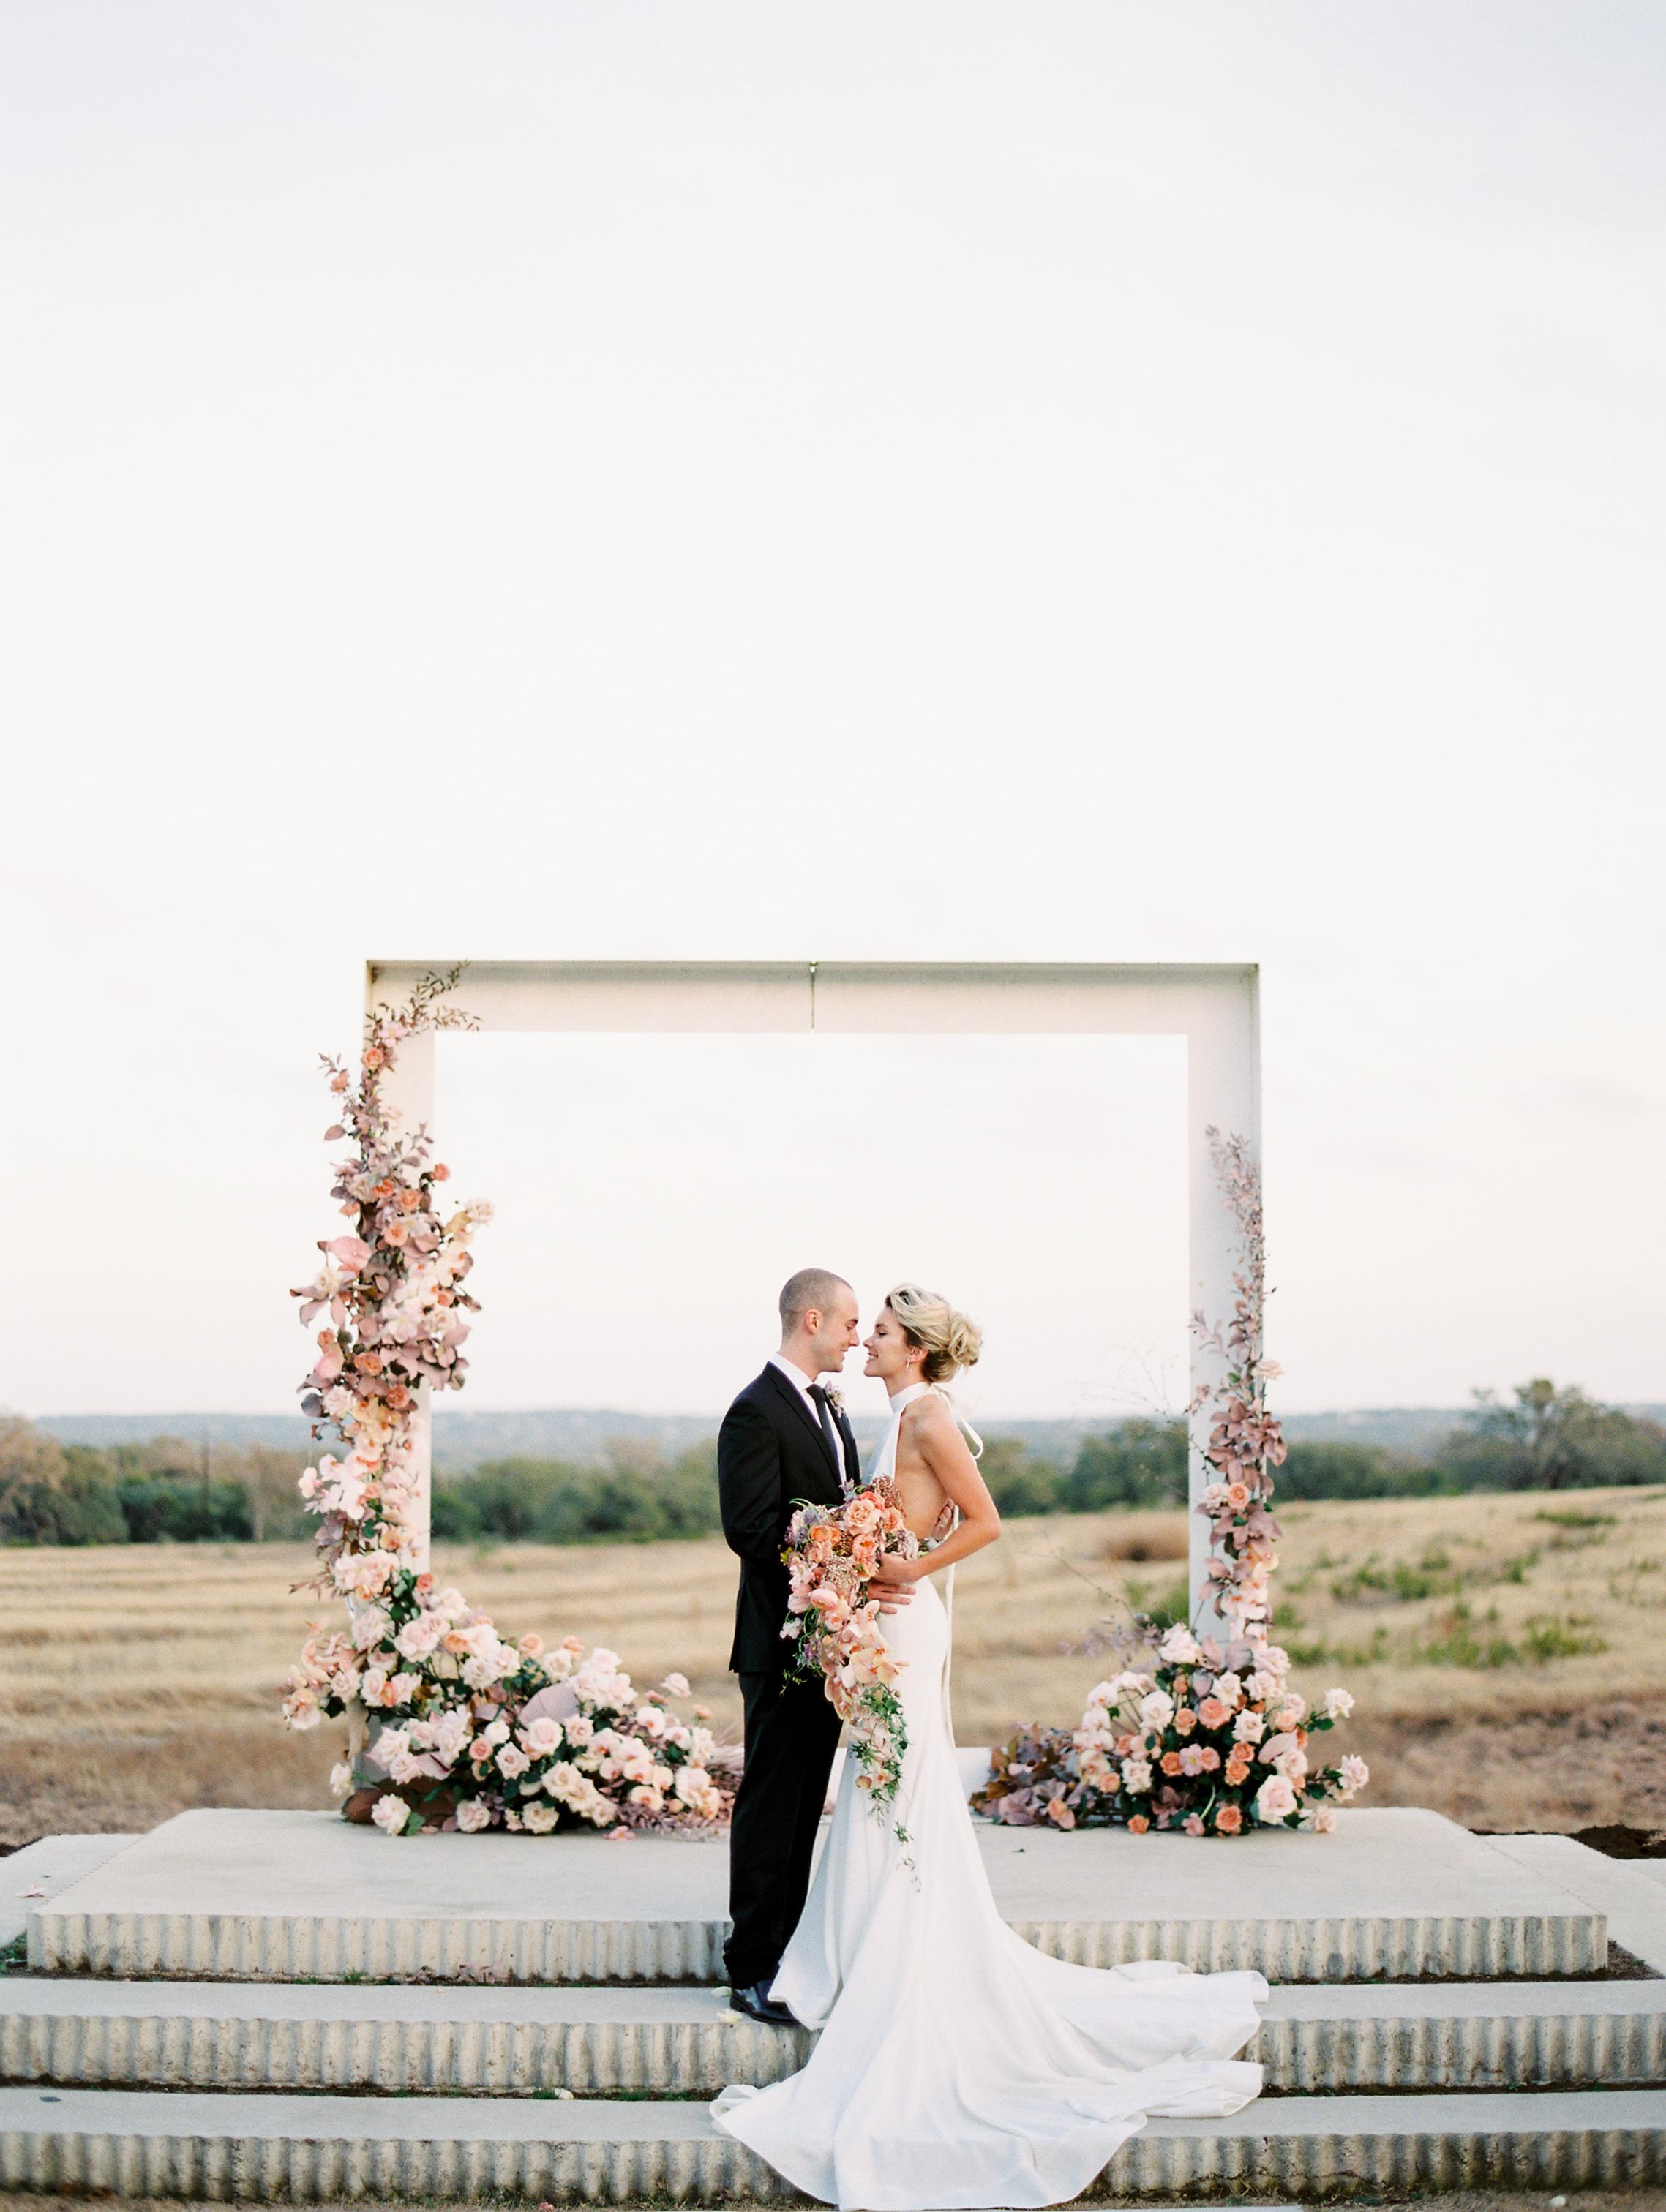 Austin-Wedding-Photography-Prospect-House-Fine-Art-Film-Destination-Dana-Josh-Fernandez-Photography-Dallas-Houston-Luxury-Best-Top-12.jpg